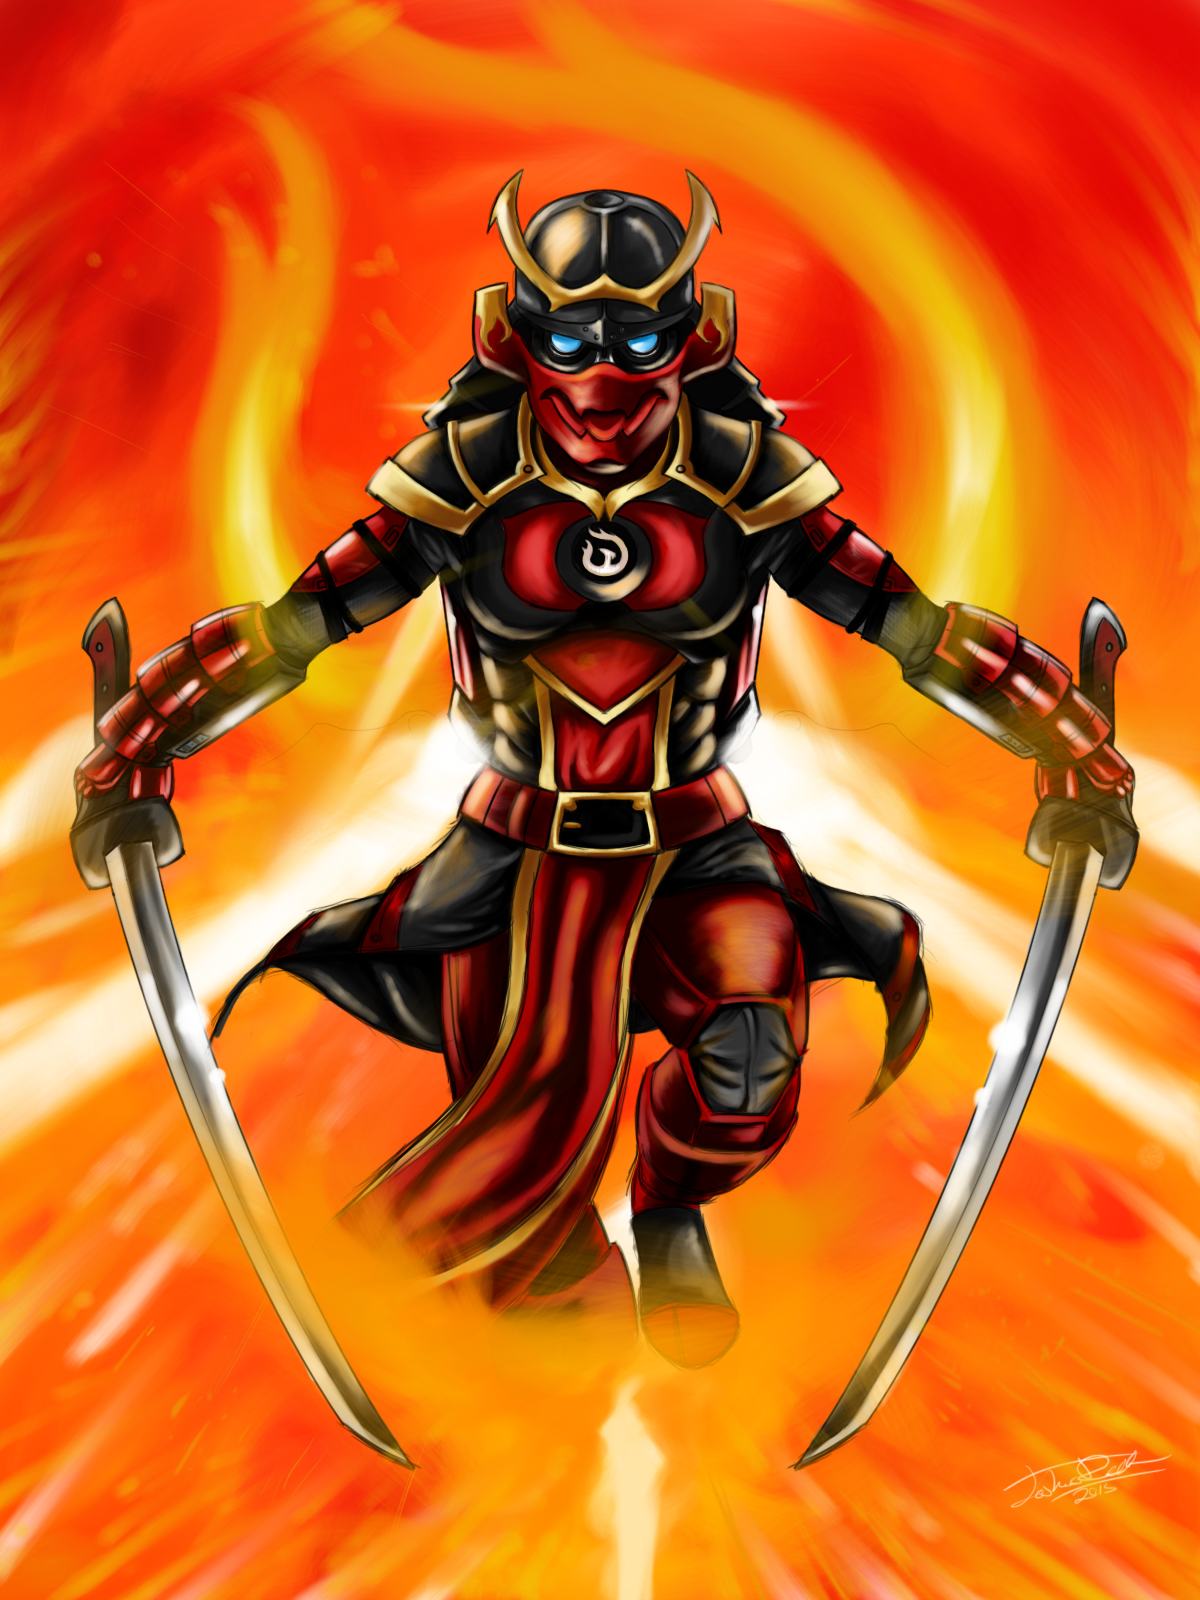 Samurai X by joshuad17 on DeviantArt